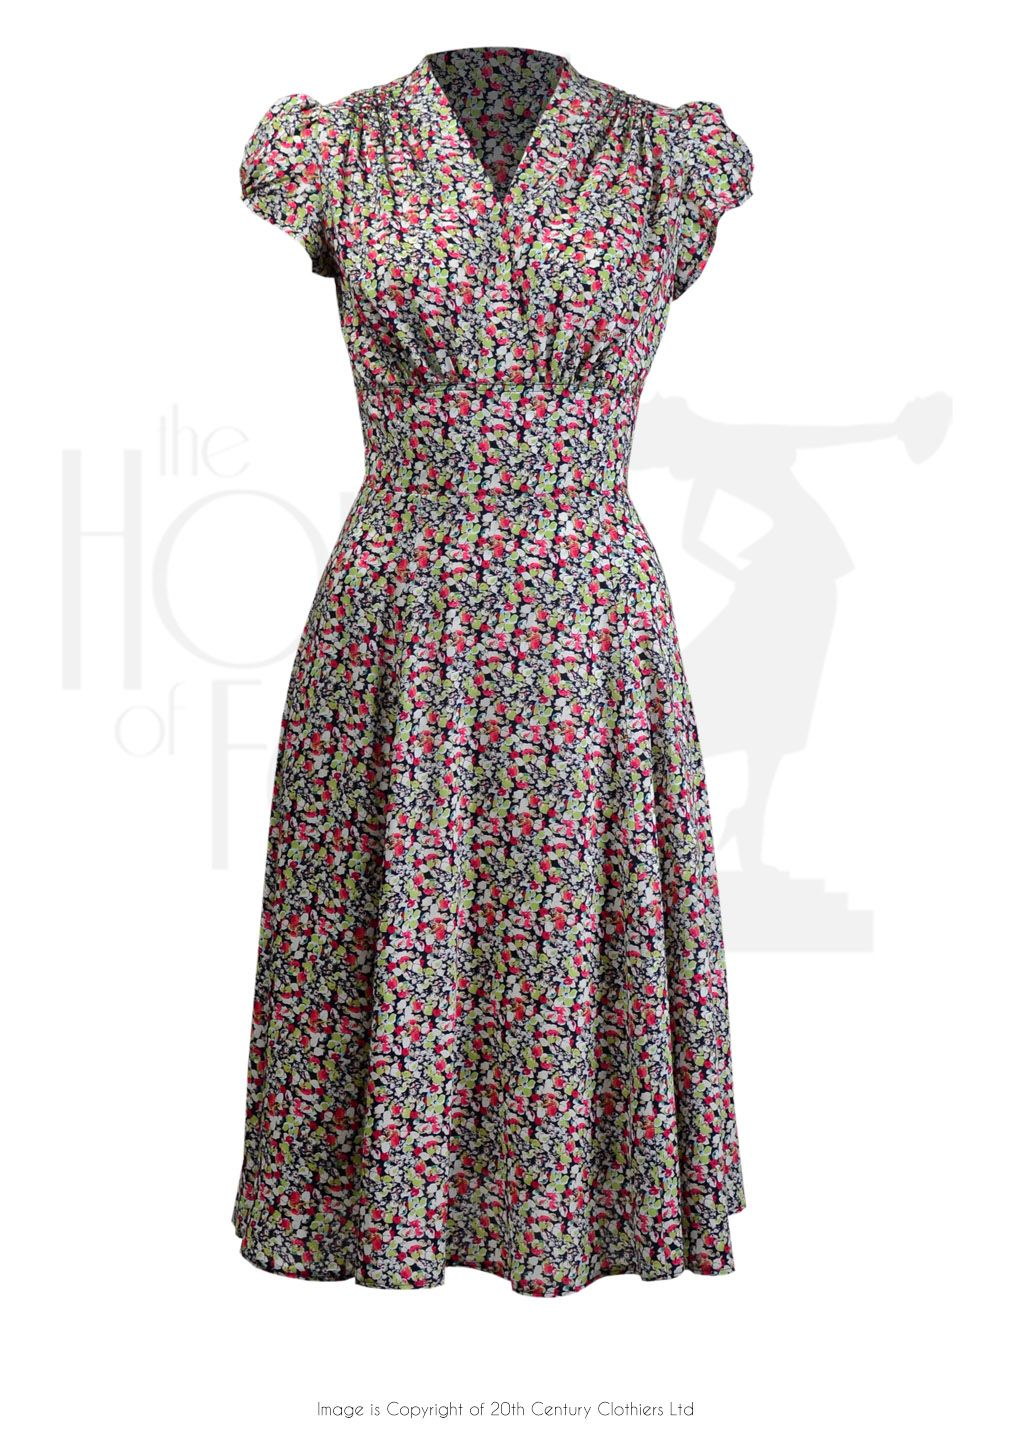 b054d0a0ad1b 1930s 40s Ava Tea Dress in Ditsy Print